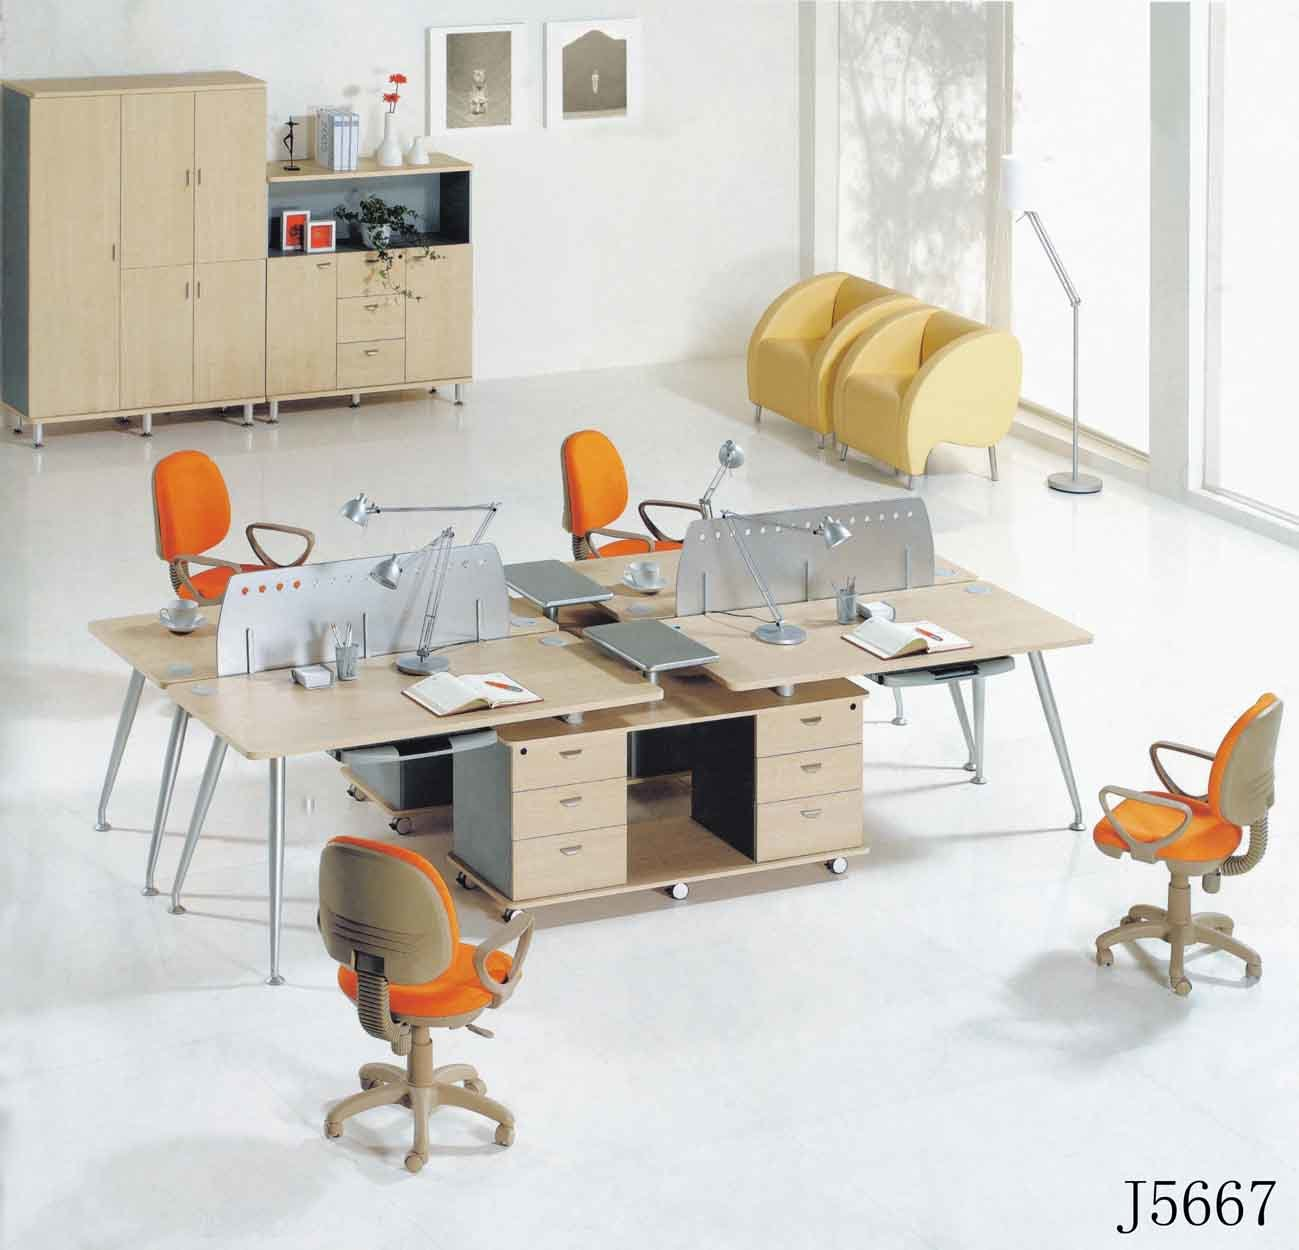 Muebles de oficinas serie ejecutiva j5667 asamblea f cil for Muebles de oficina volumen